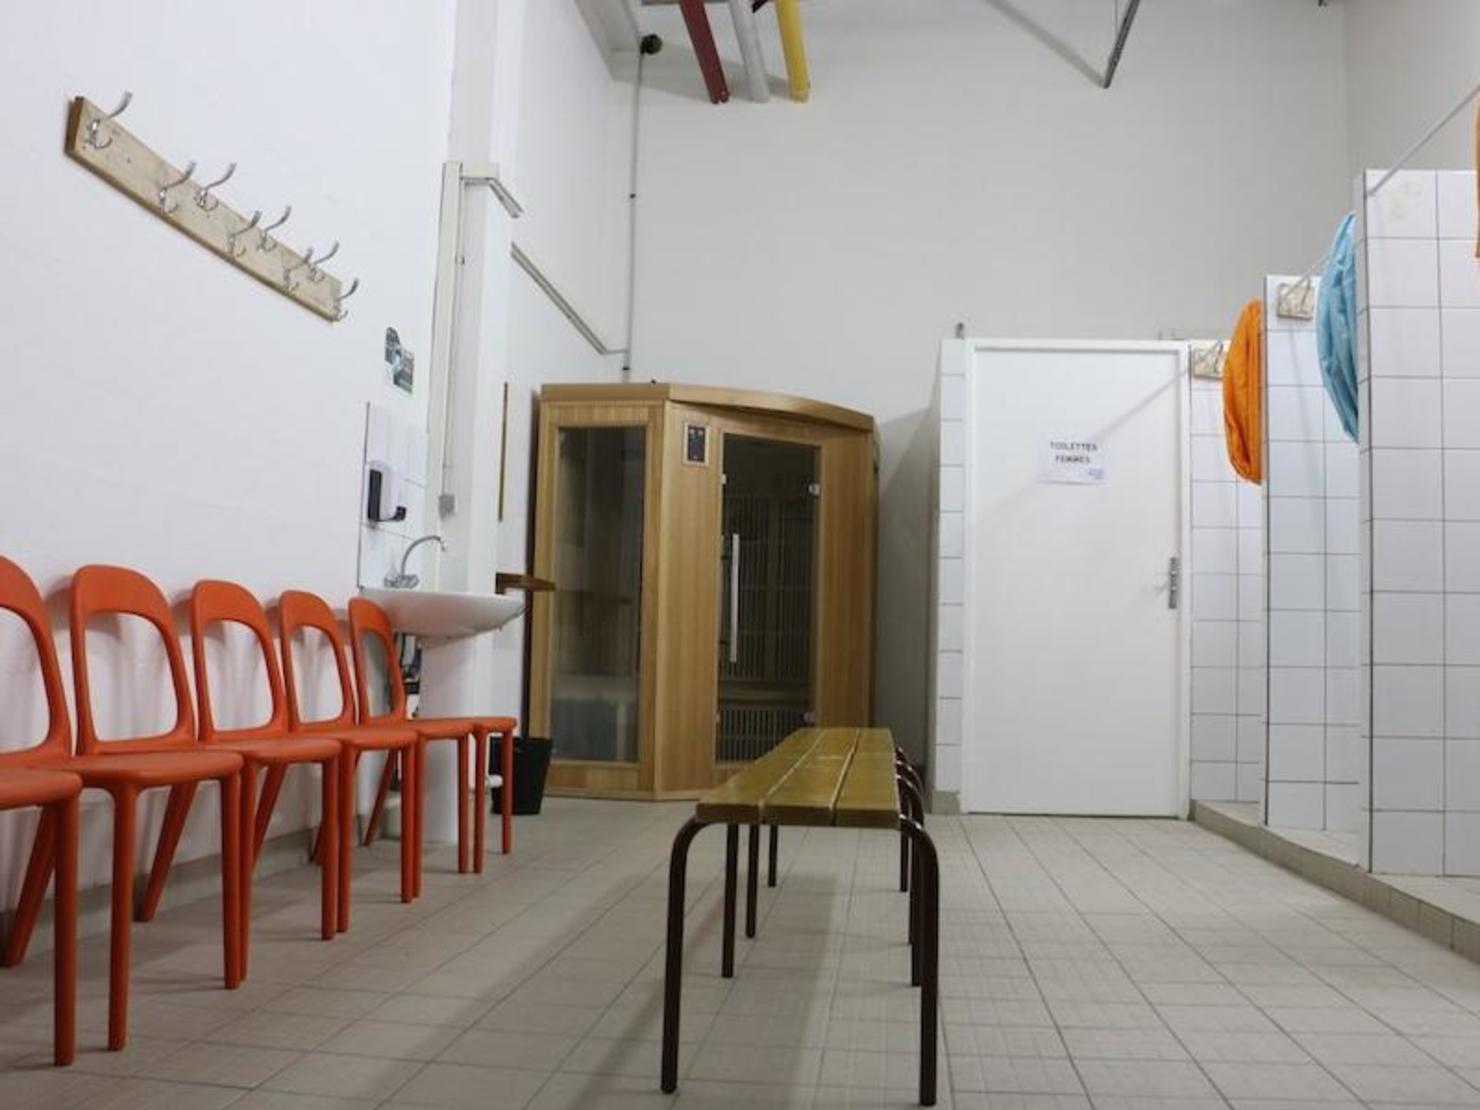 l 39 orange bleue cergy tarifs avis horaires essai gratuit. Black Bedroom Furniture Sets. Home Design Ideas